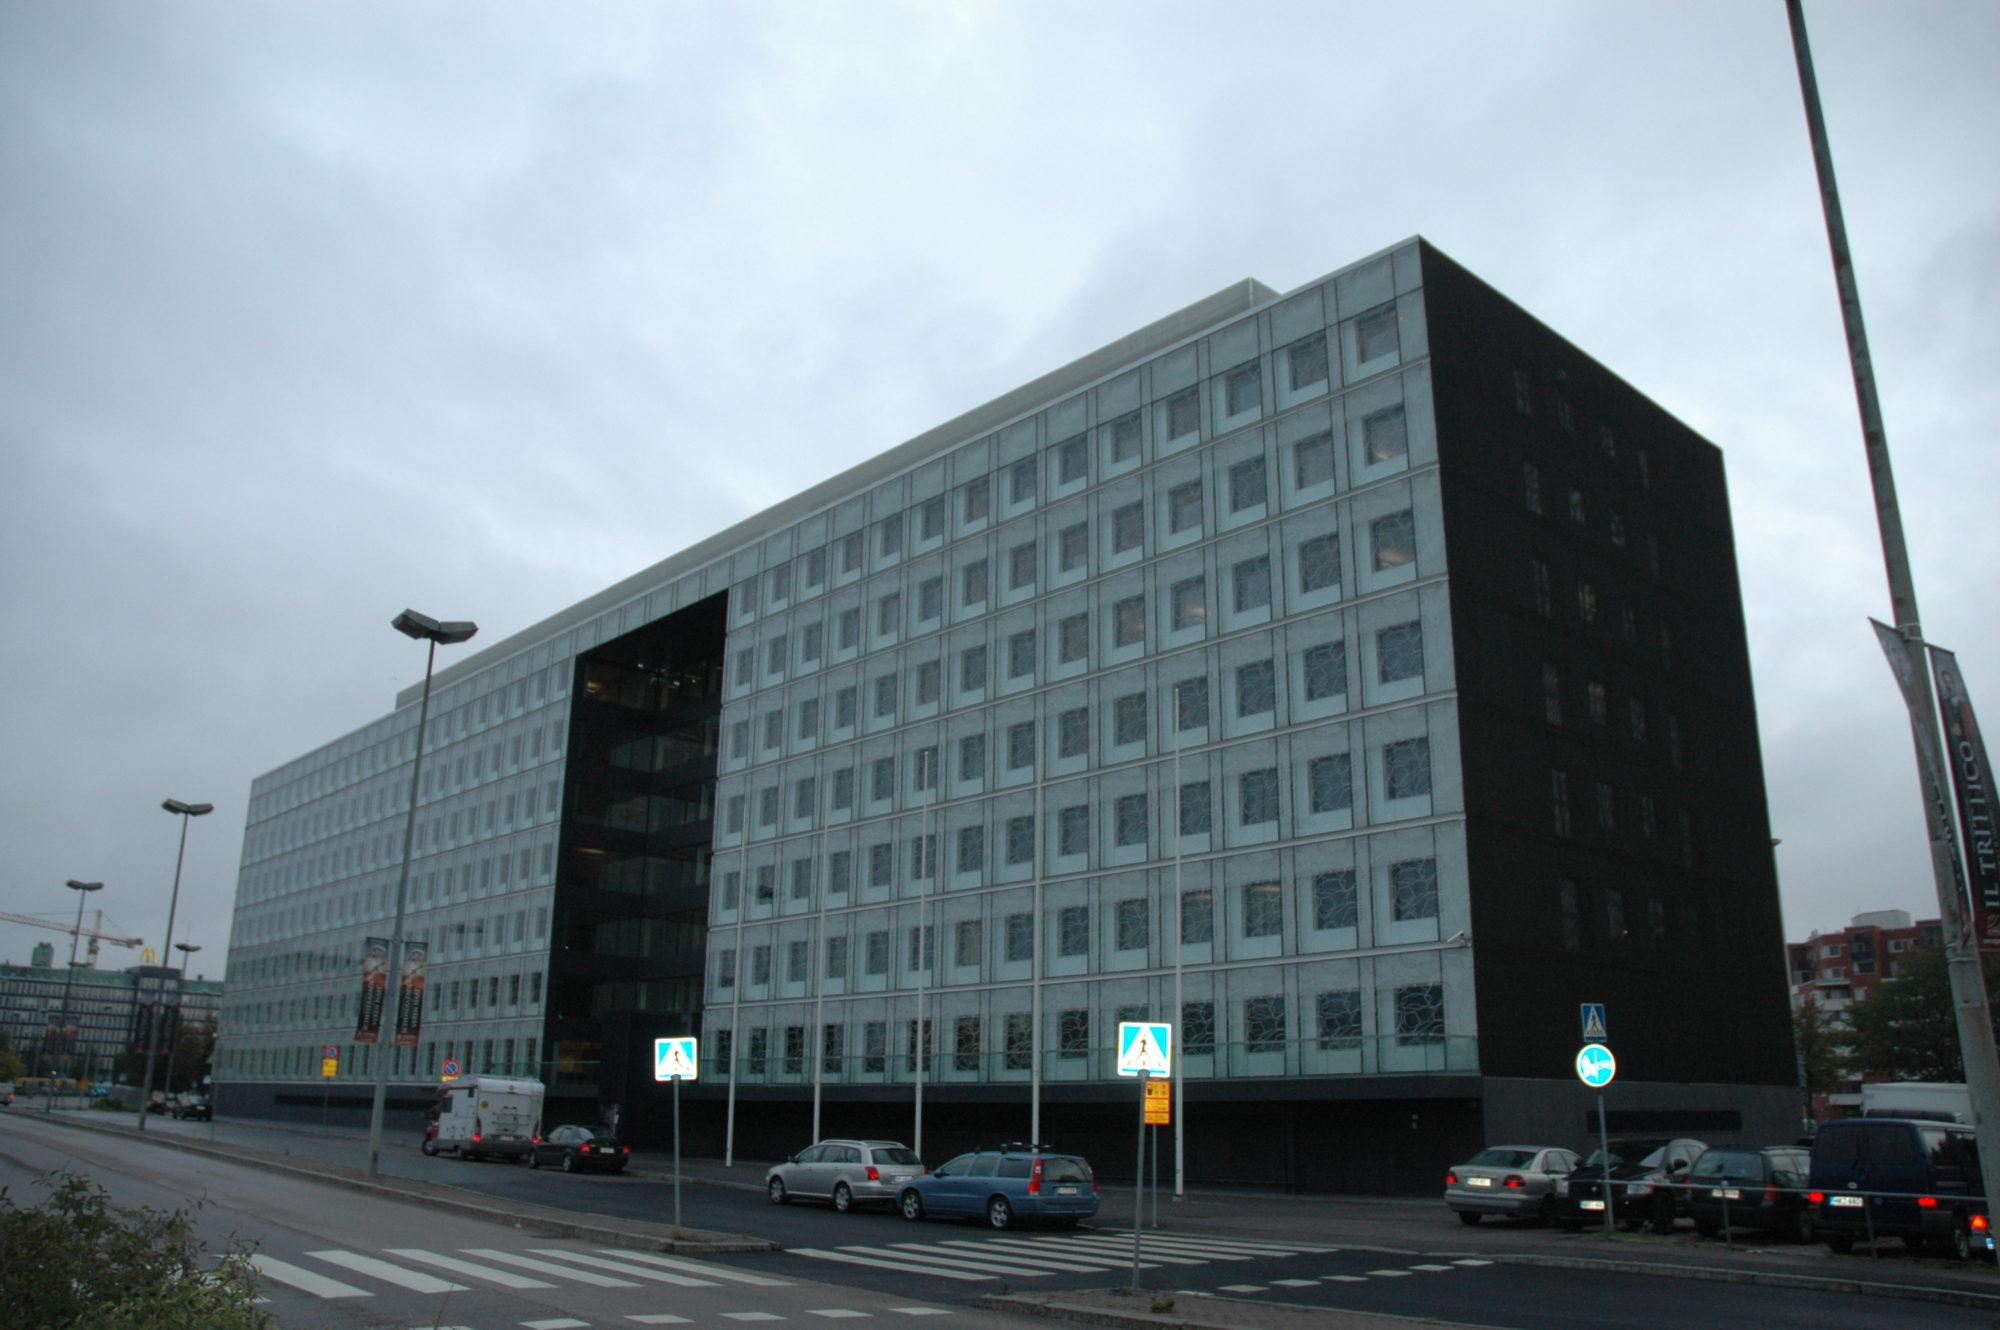 Hakaniemenranta 6, Helsinki